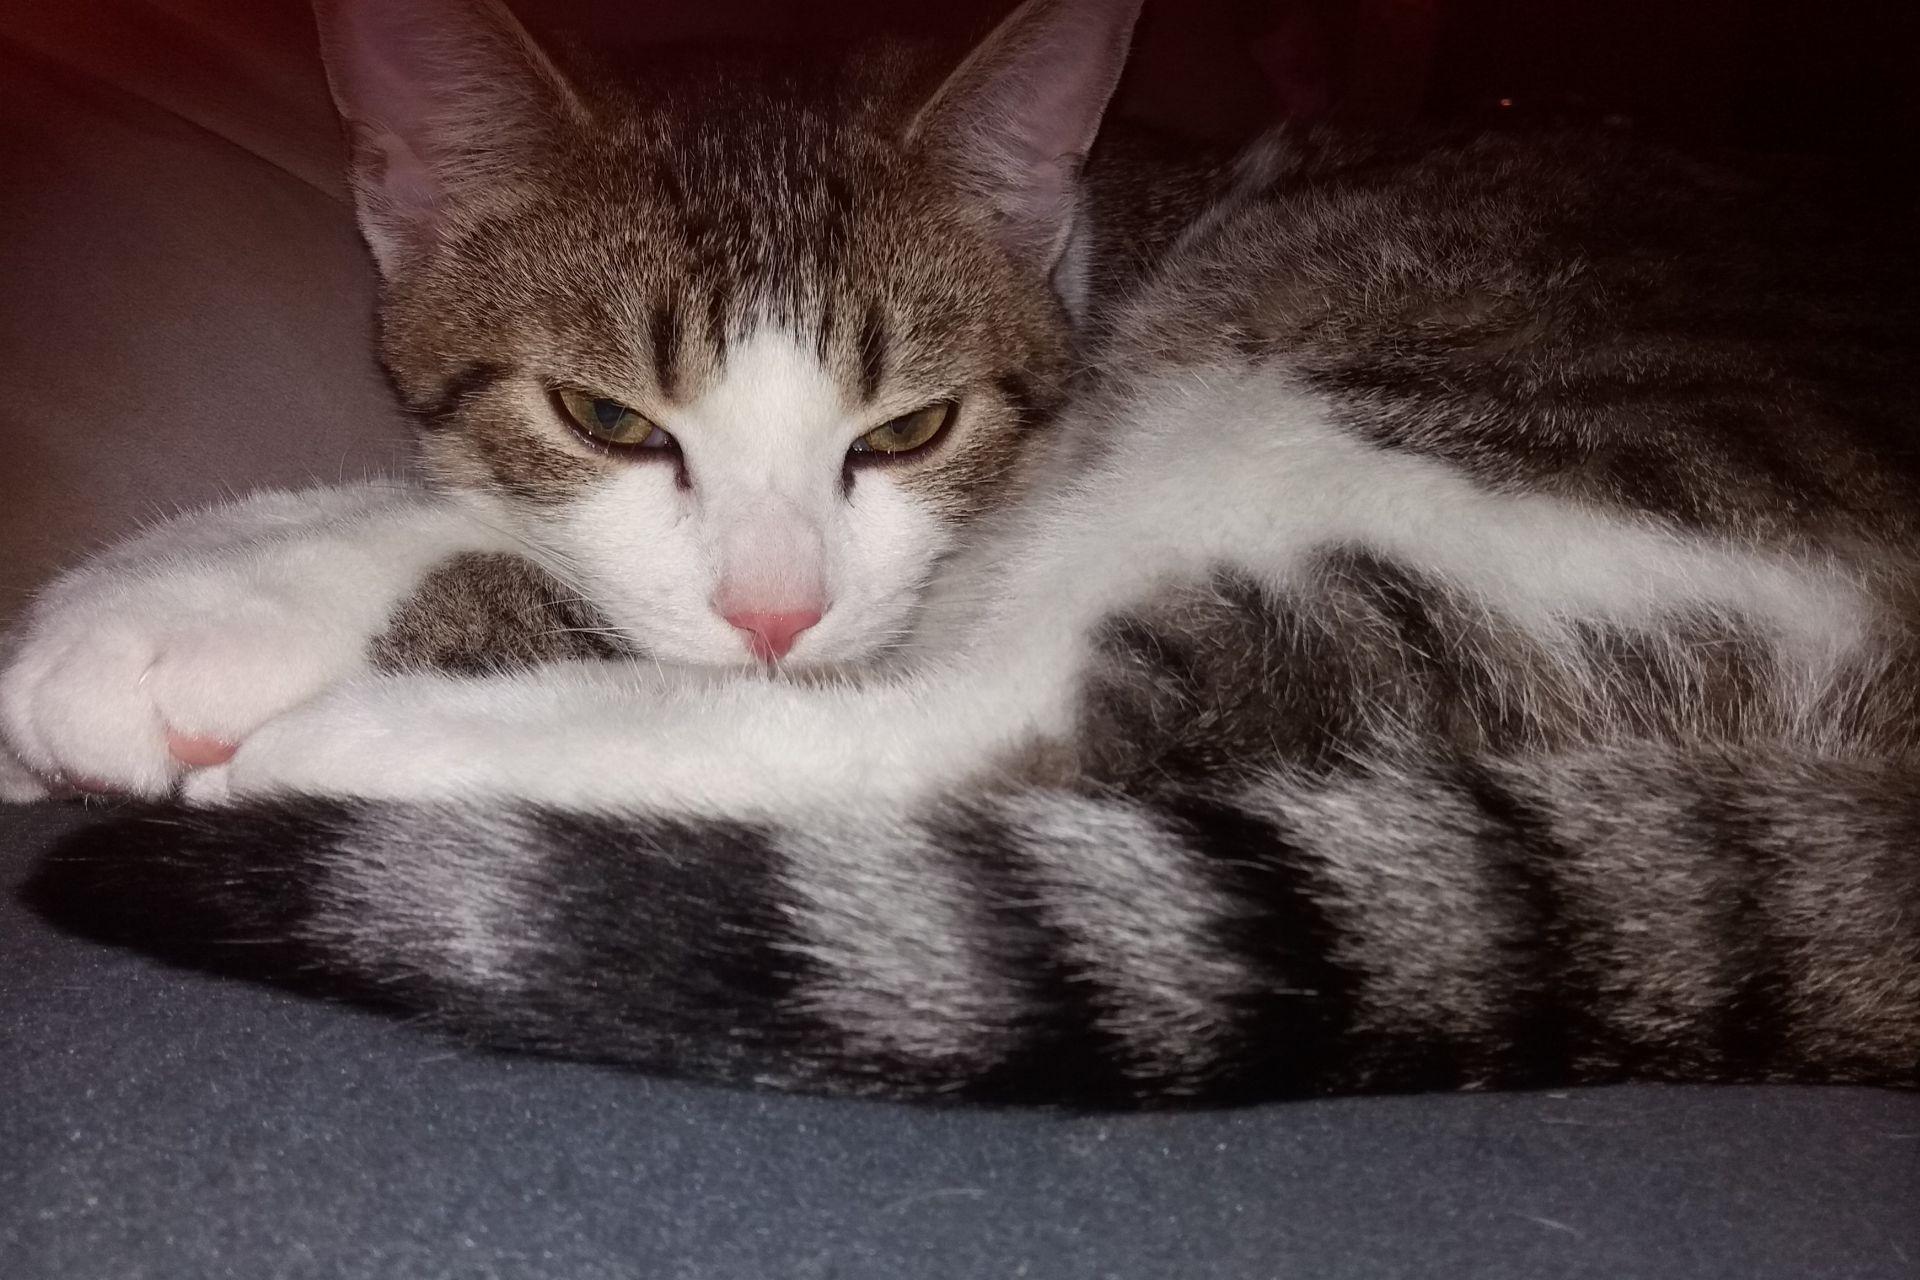 Cyperse kat Amsterdam-West vermist op 1 januari 2019